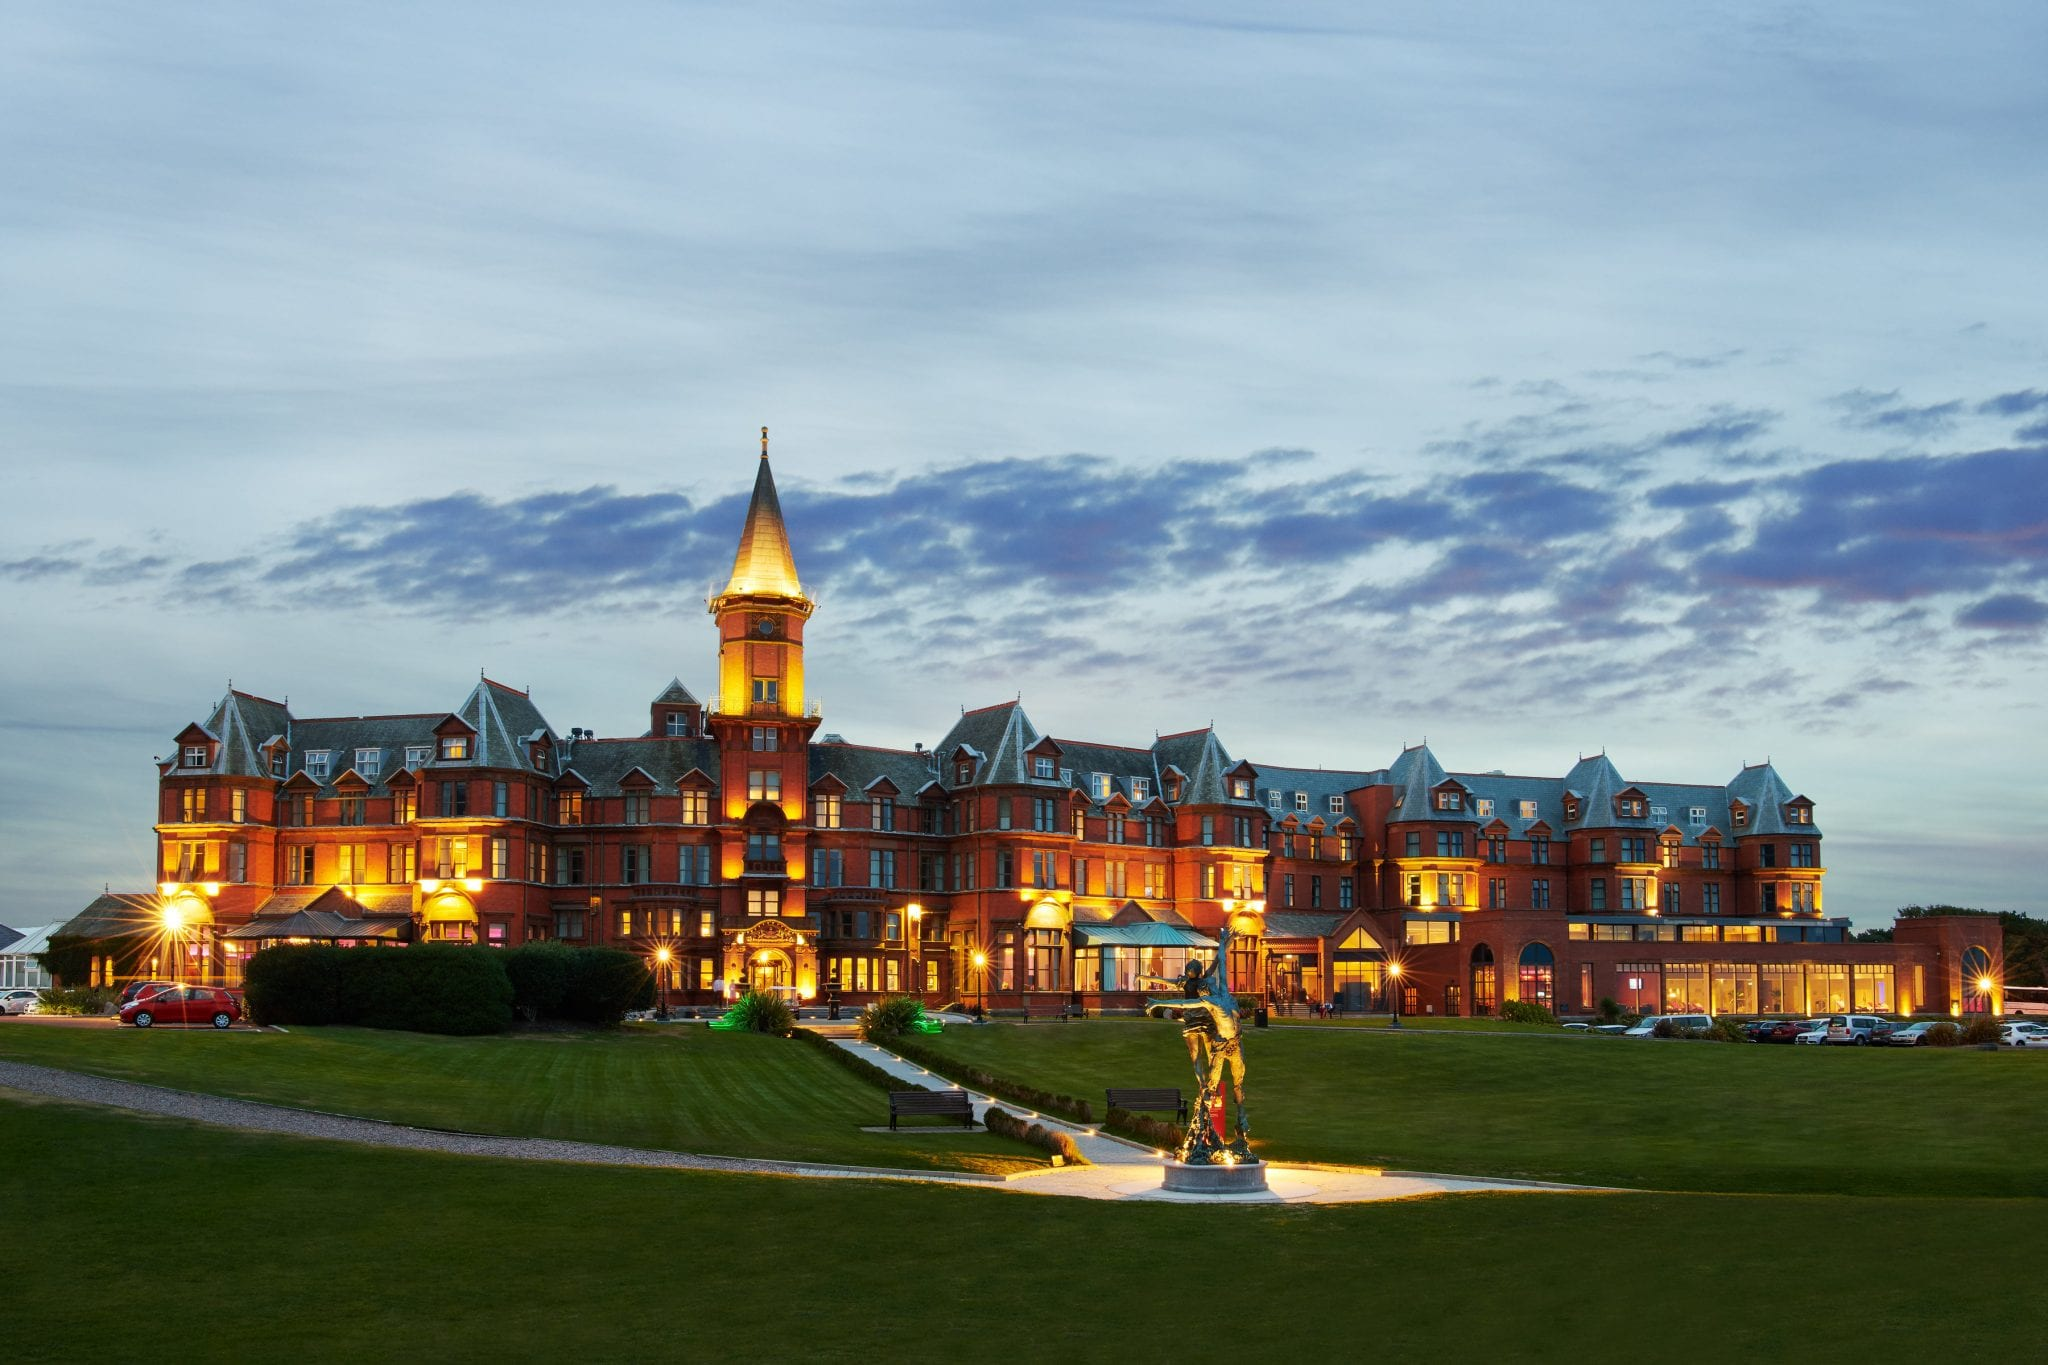 Slieve Donard Resort invests £1.1m in renovation programme